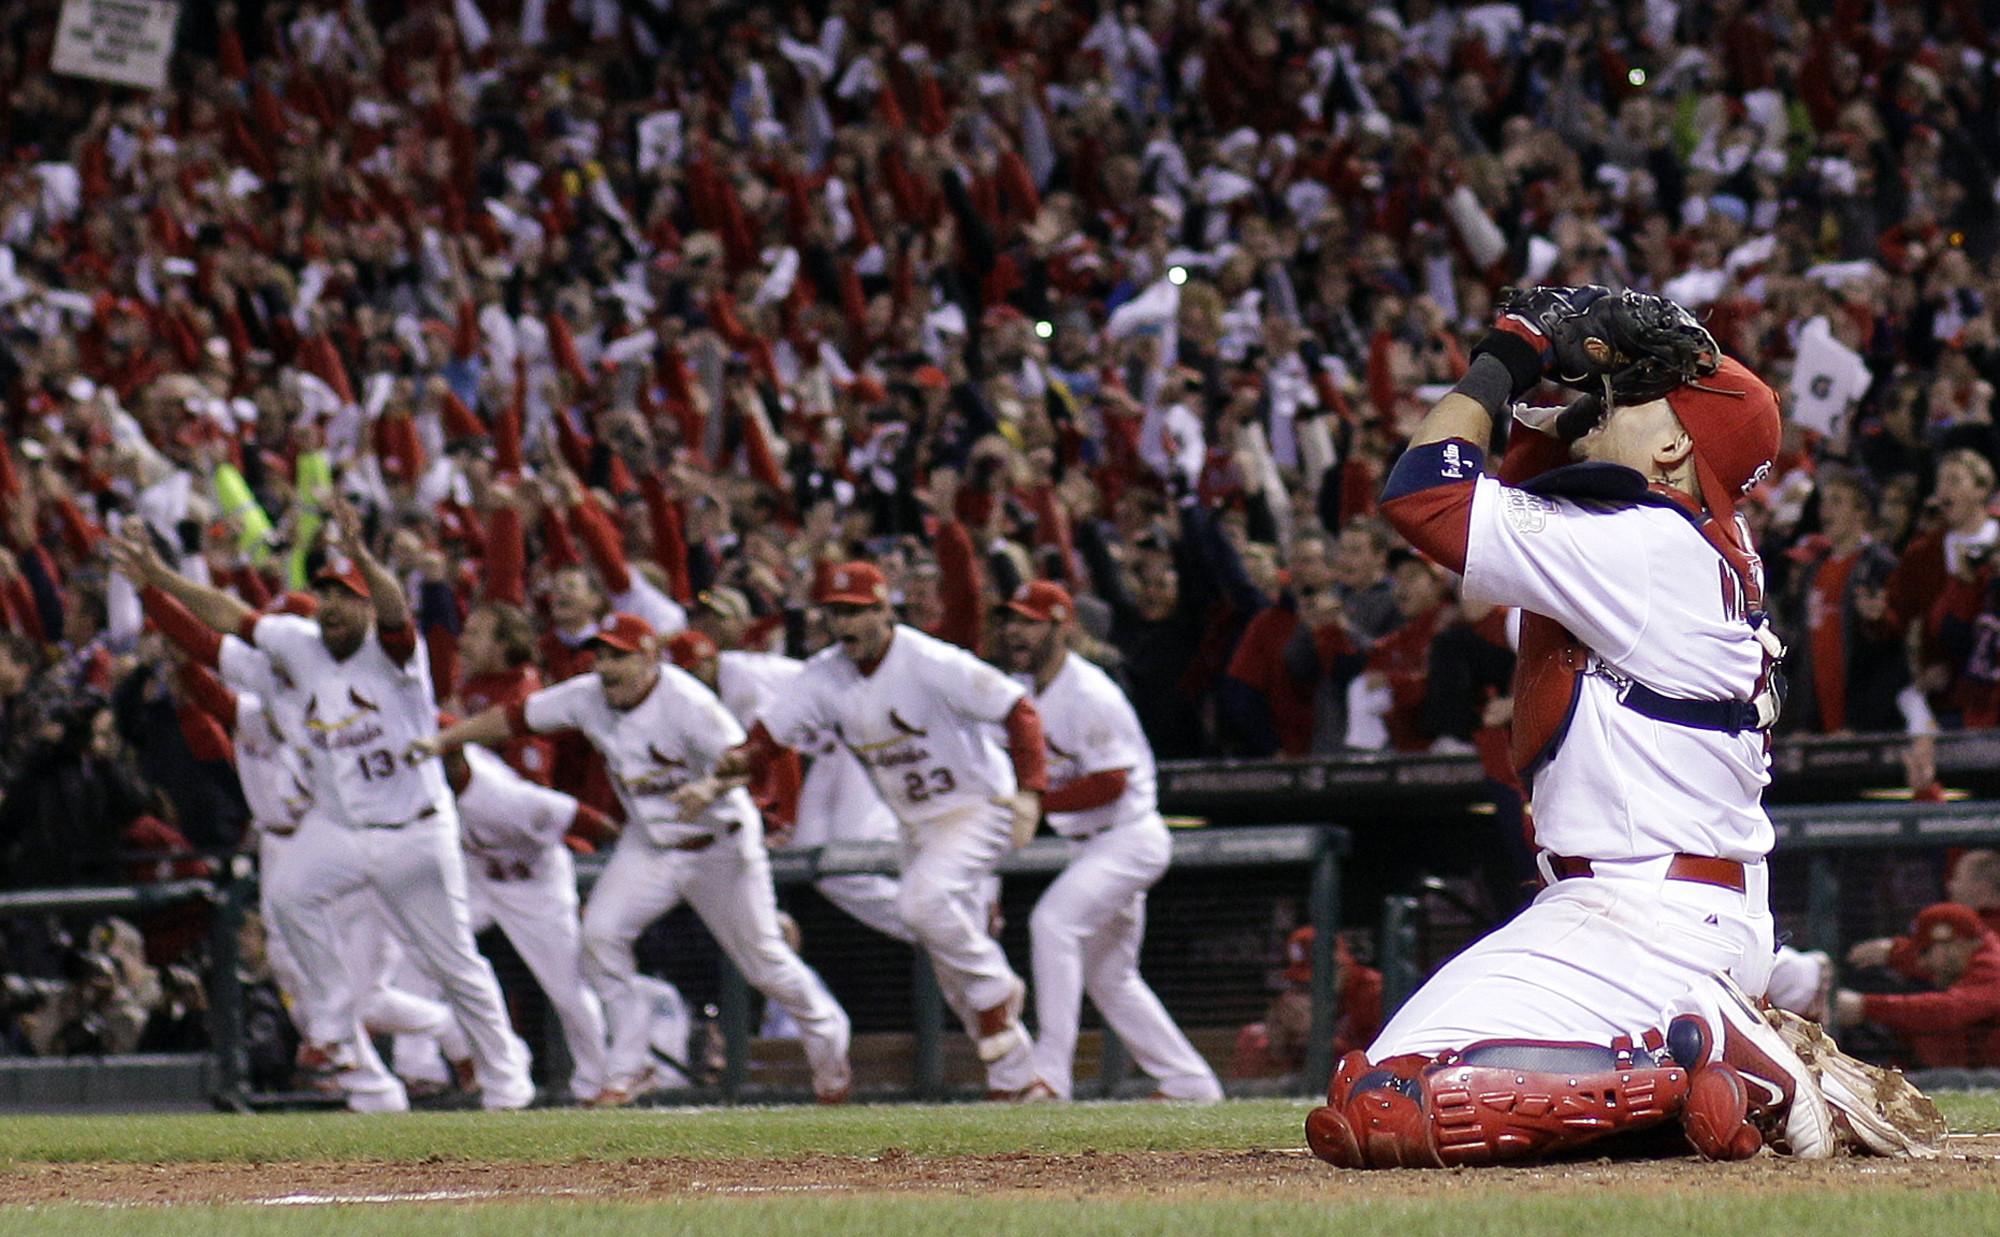 st louis cardinals baseball wallpapers background. Download Wallpaper /  Select Resolution ↓. Original. 2000×1237